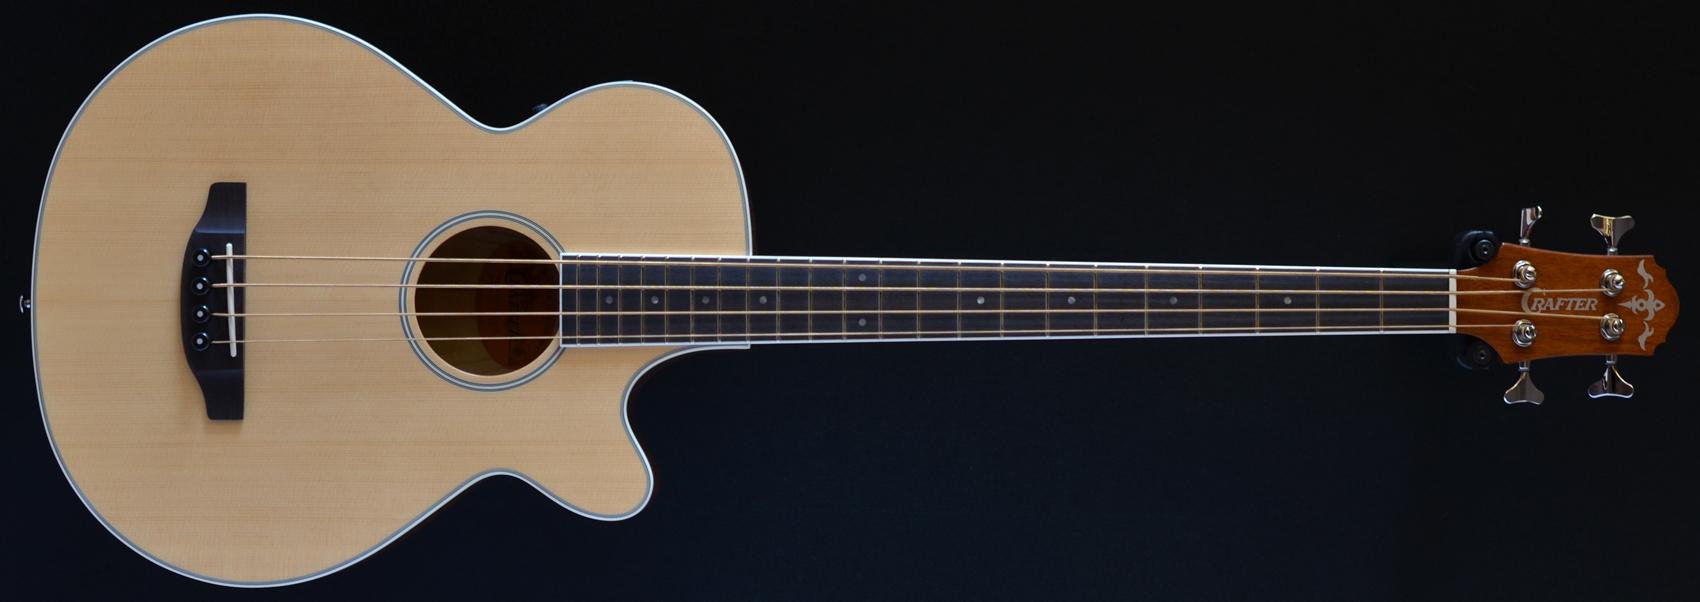 Used Yamaha Bass Guitar